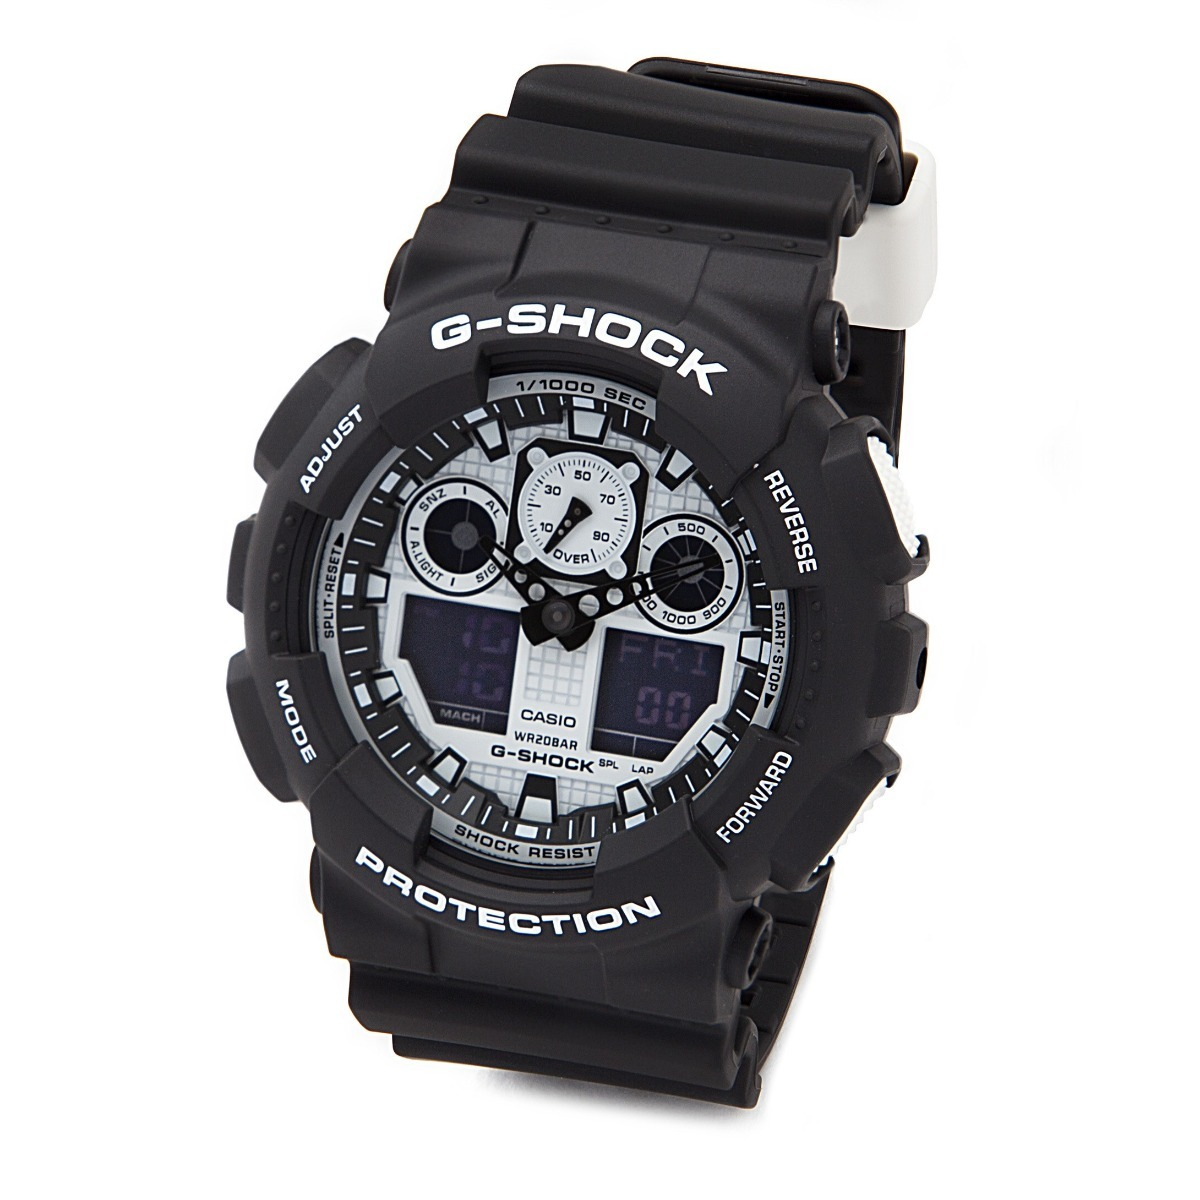 Reloj Casio G shock Ga100bw 1a En Stock Original Garantia